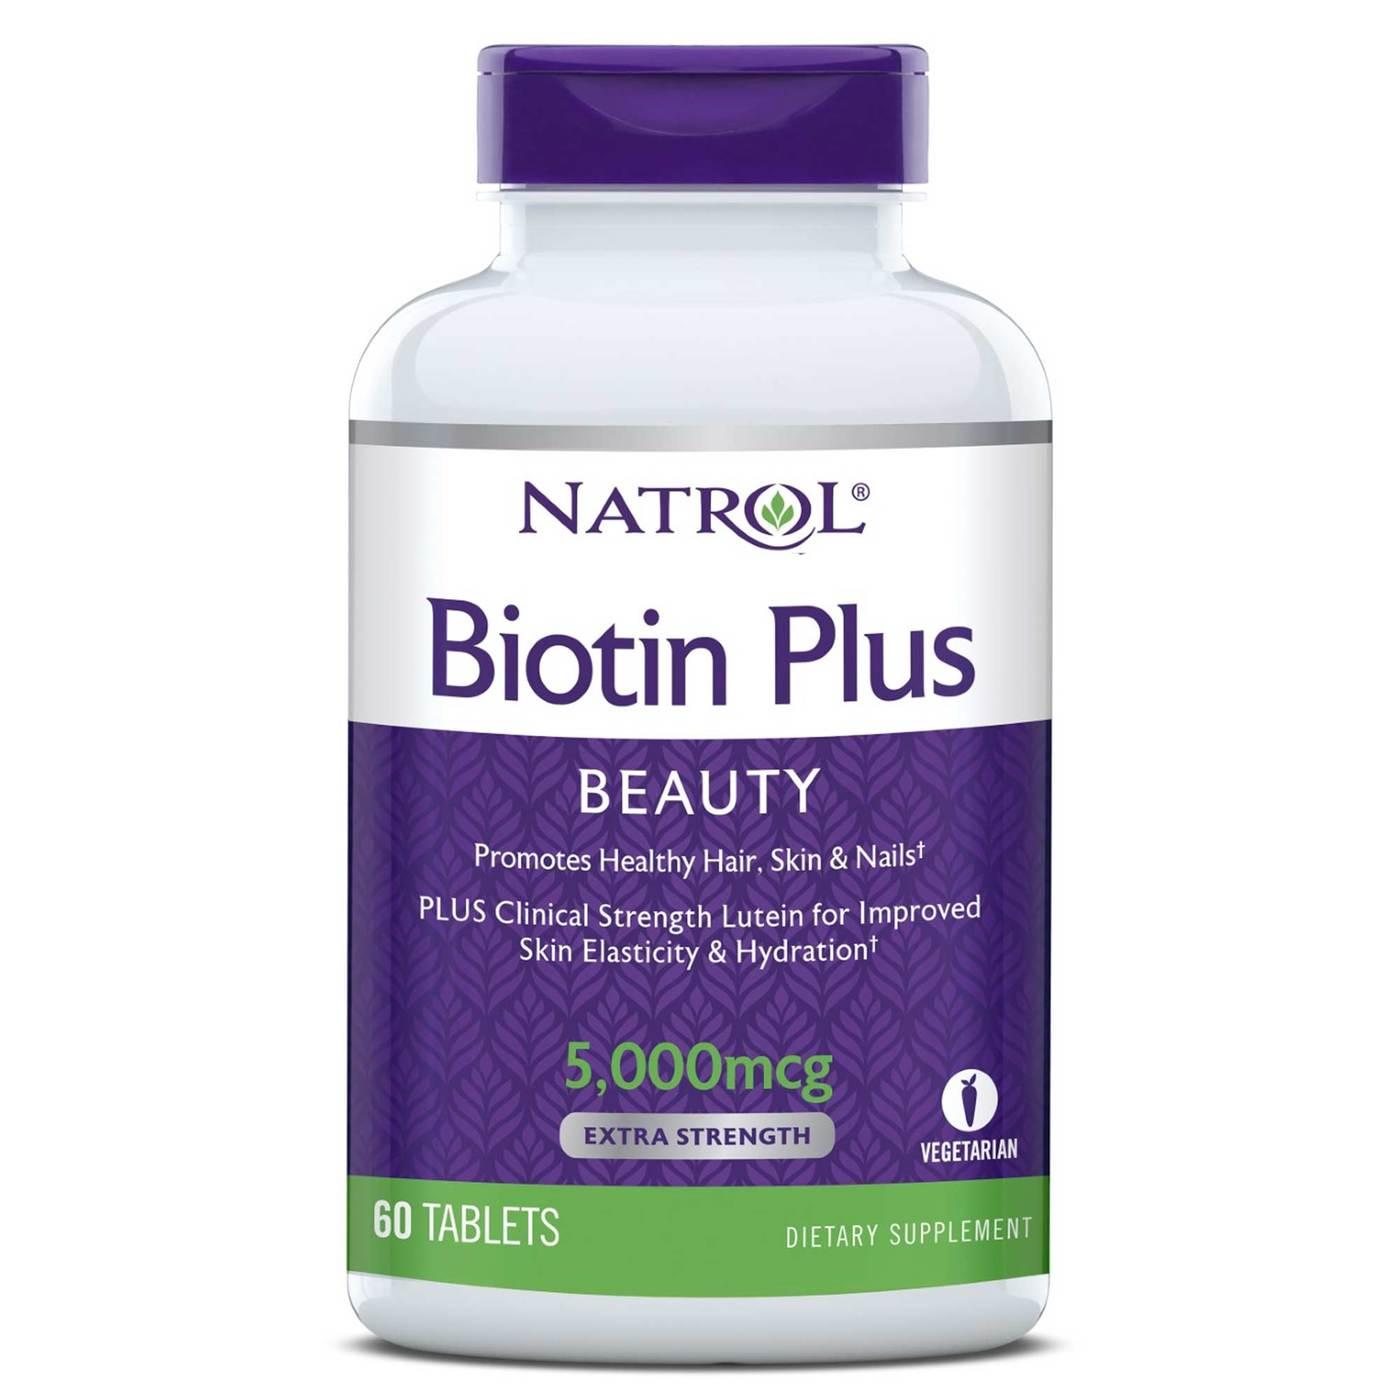 94bc1d9205 Biotina mais Natrol 60 Tabletes - Menor Preço em Brasil